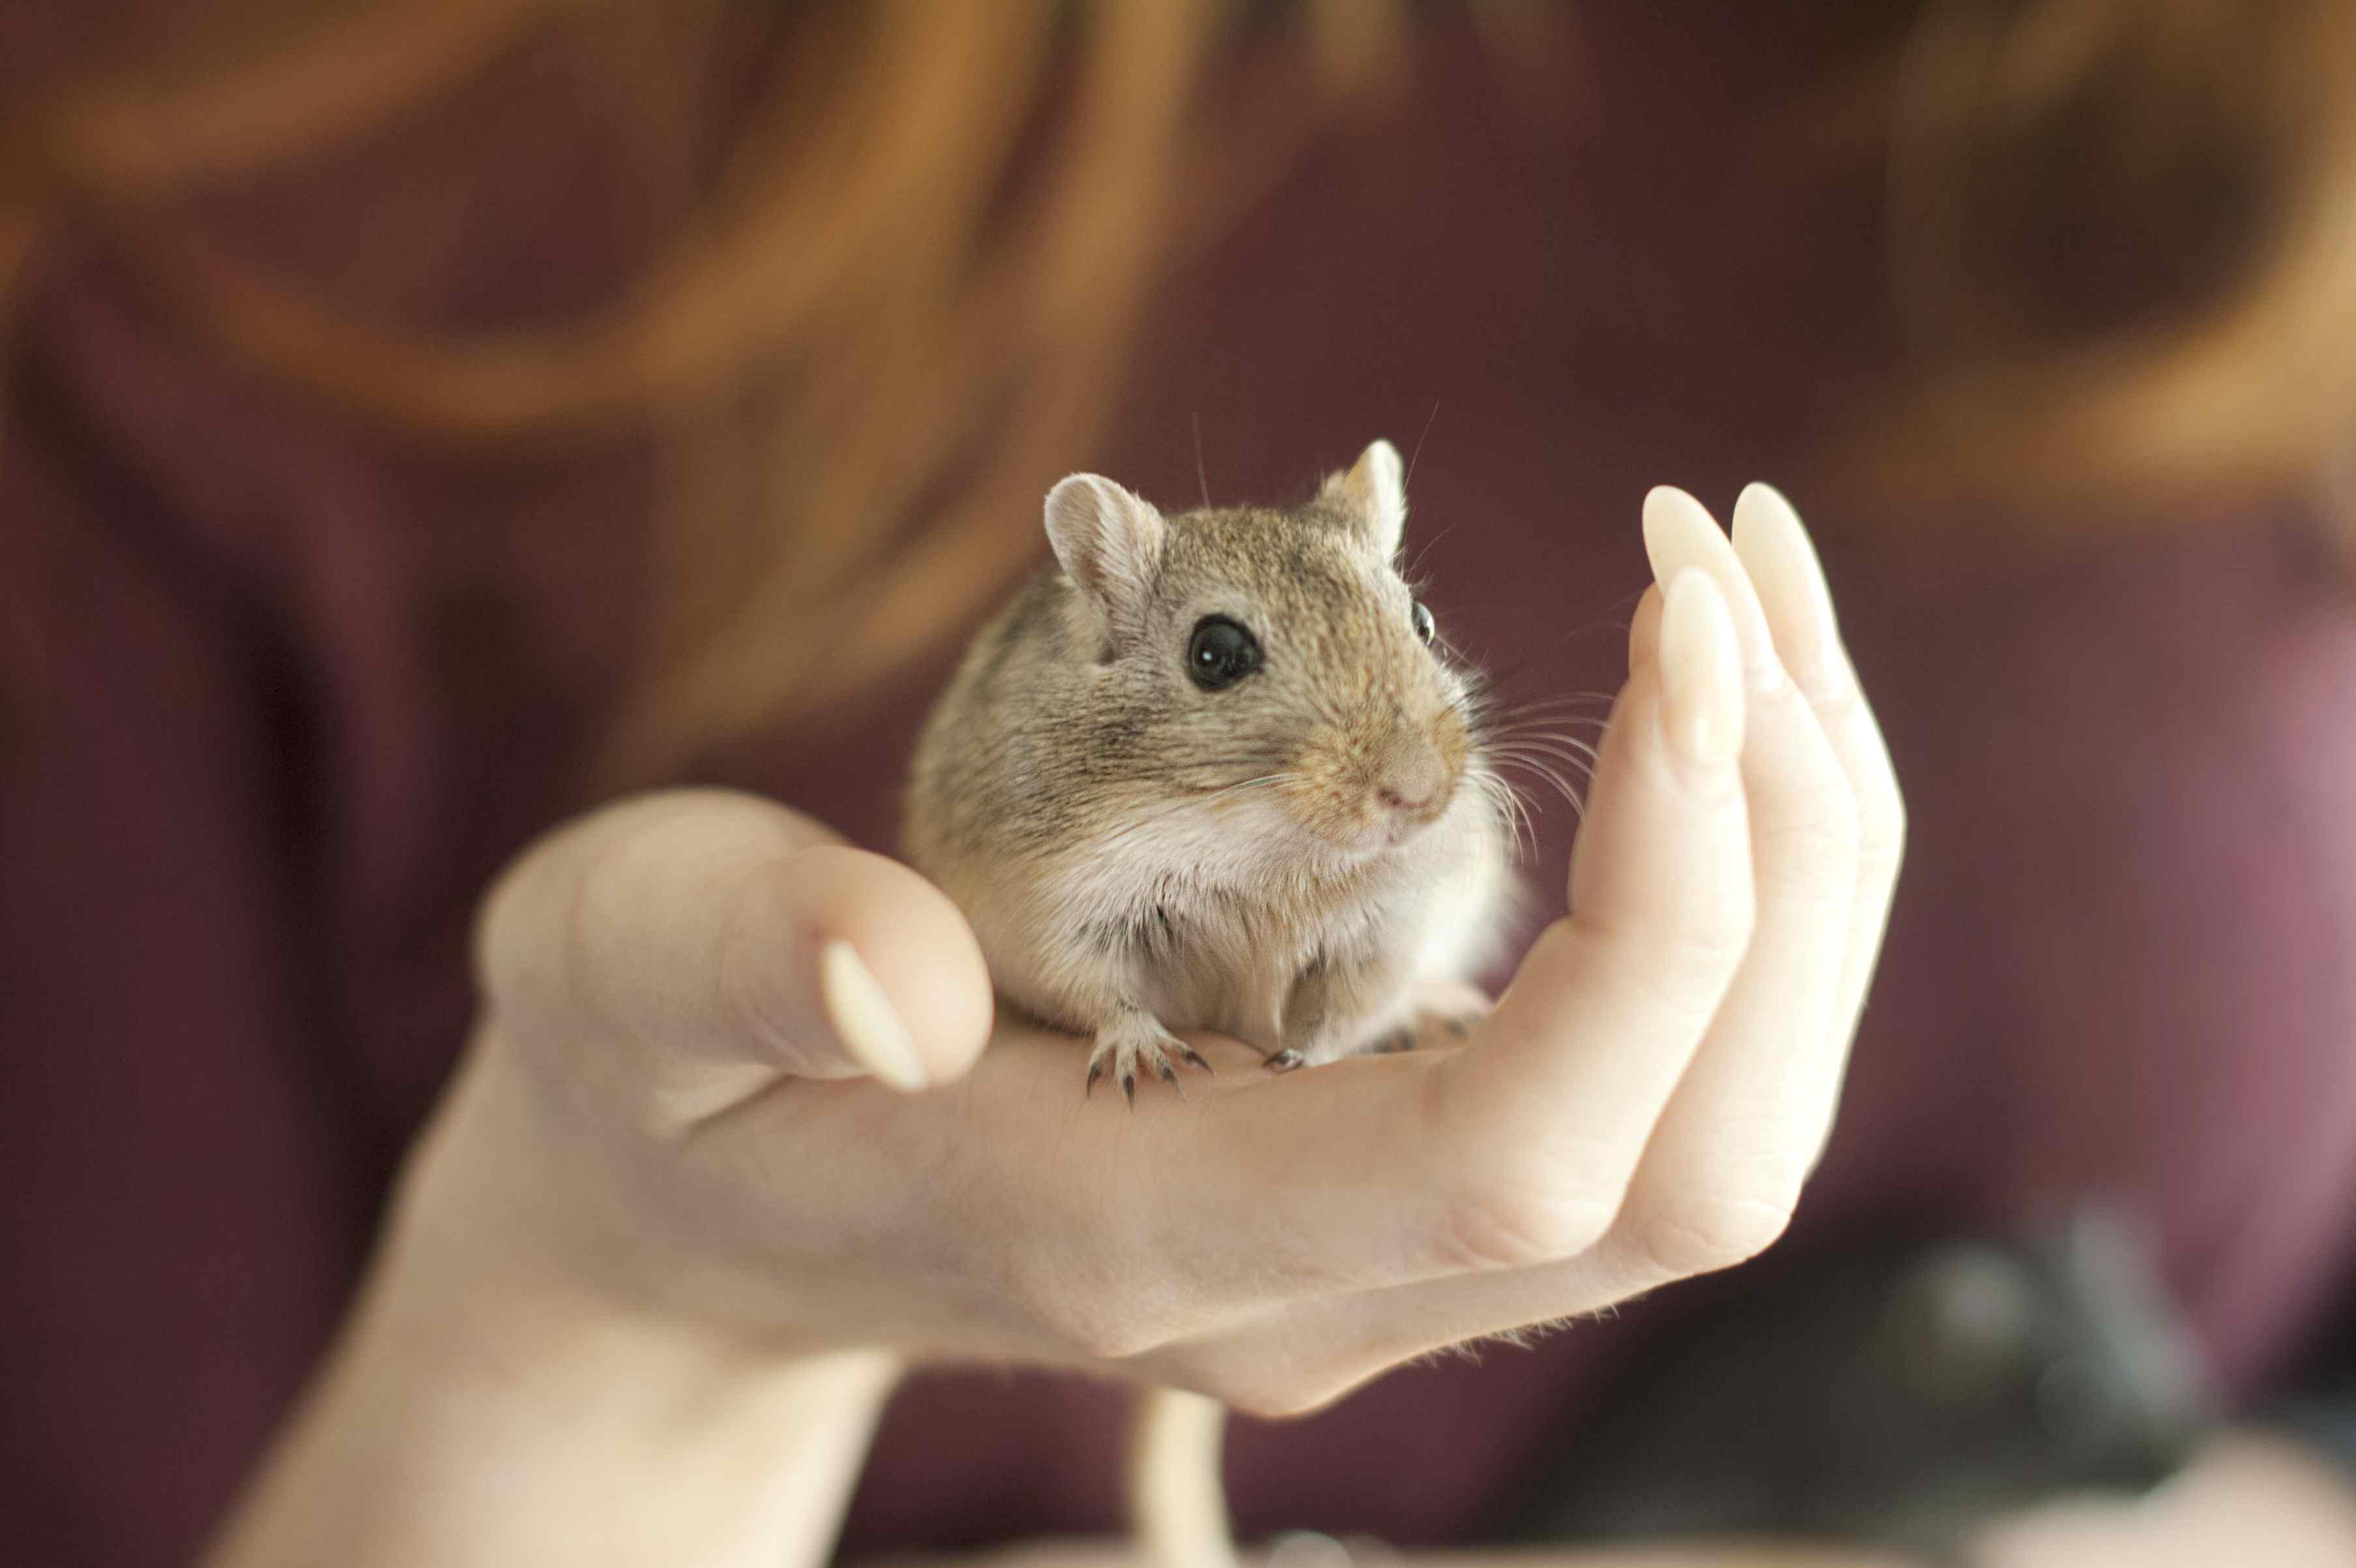 Pet Gerbil in Hand